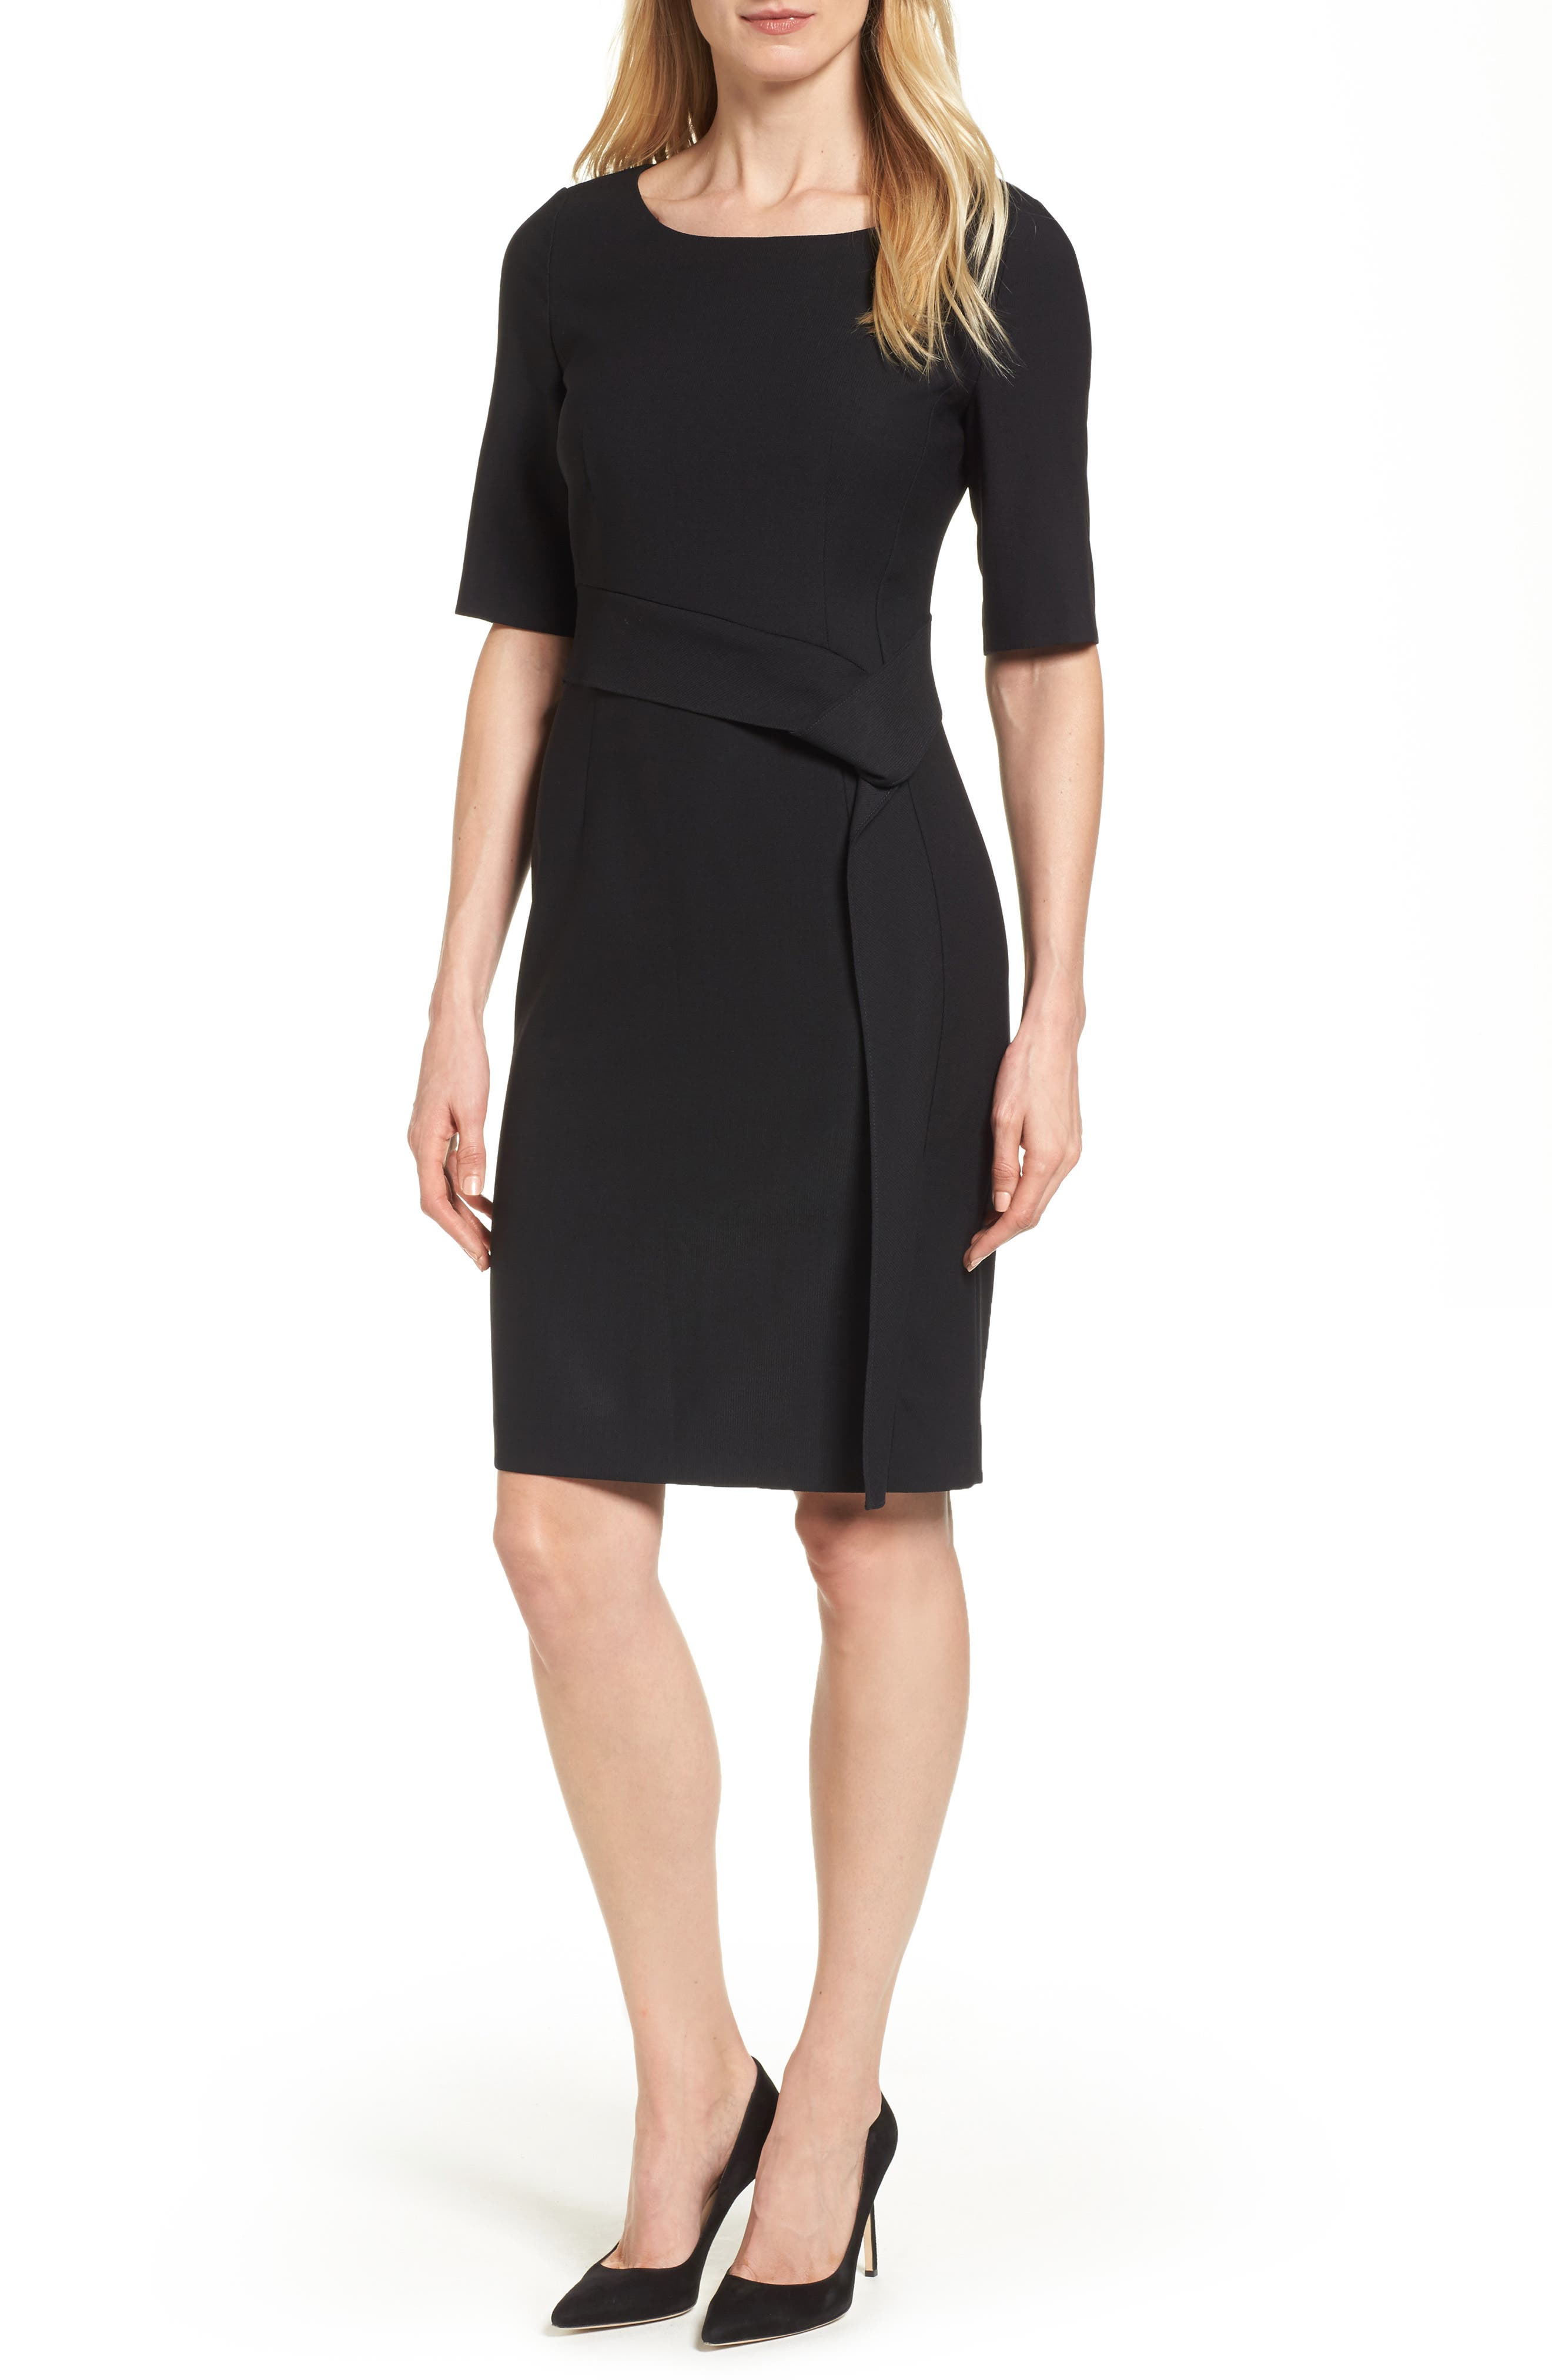 Delera Stretch Wool Sheath Dress,                             Main thumbnail 1, color,                             Black